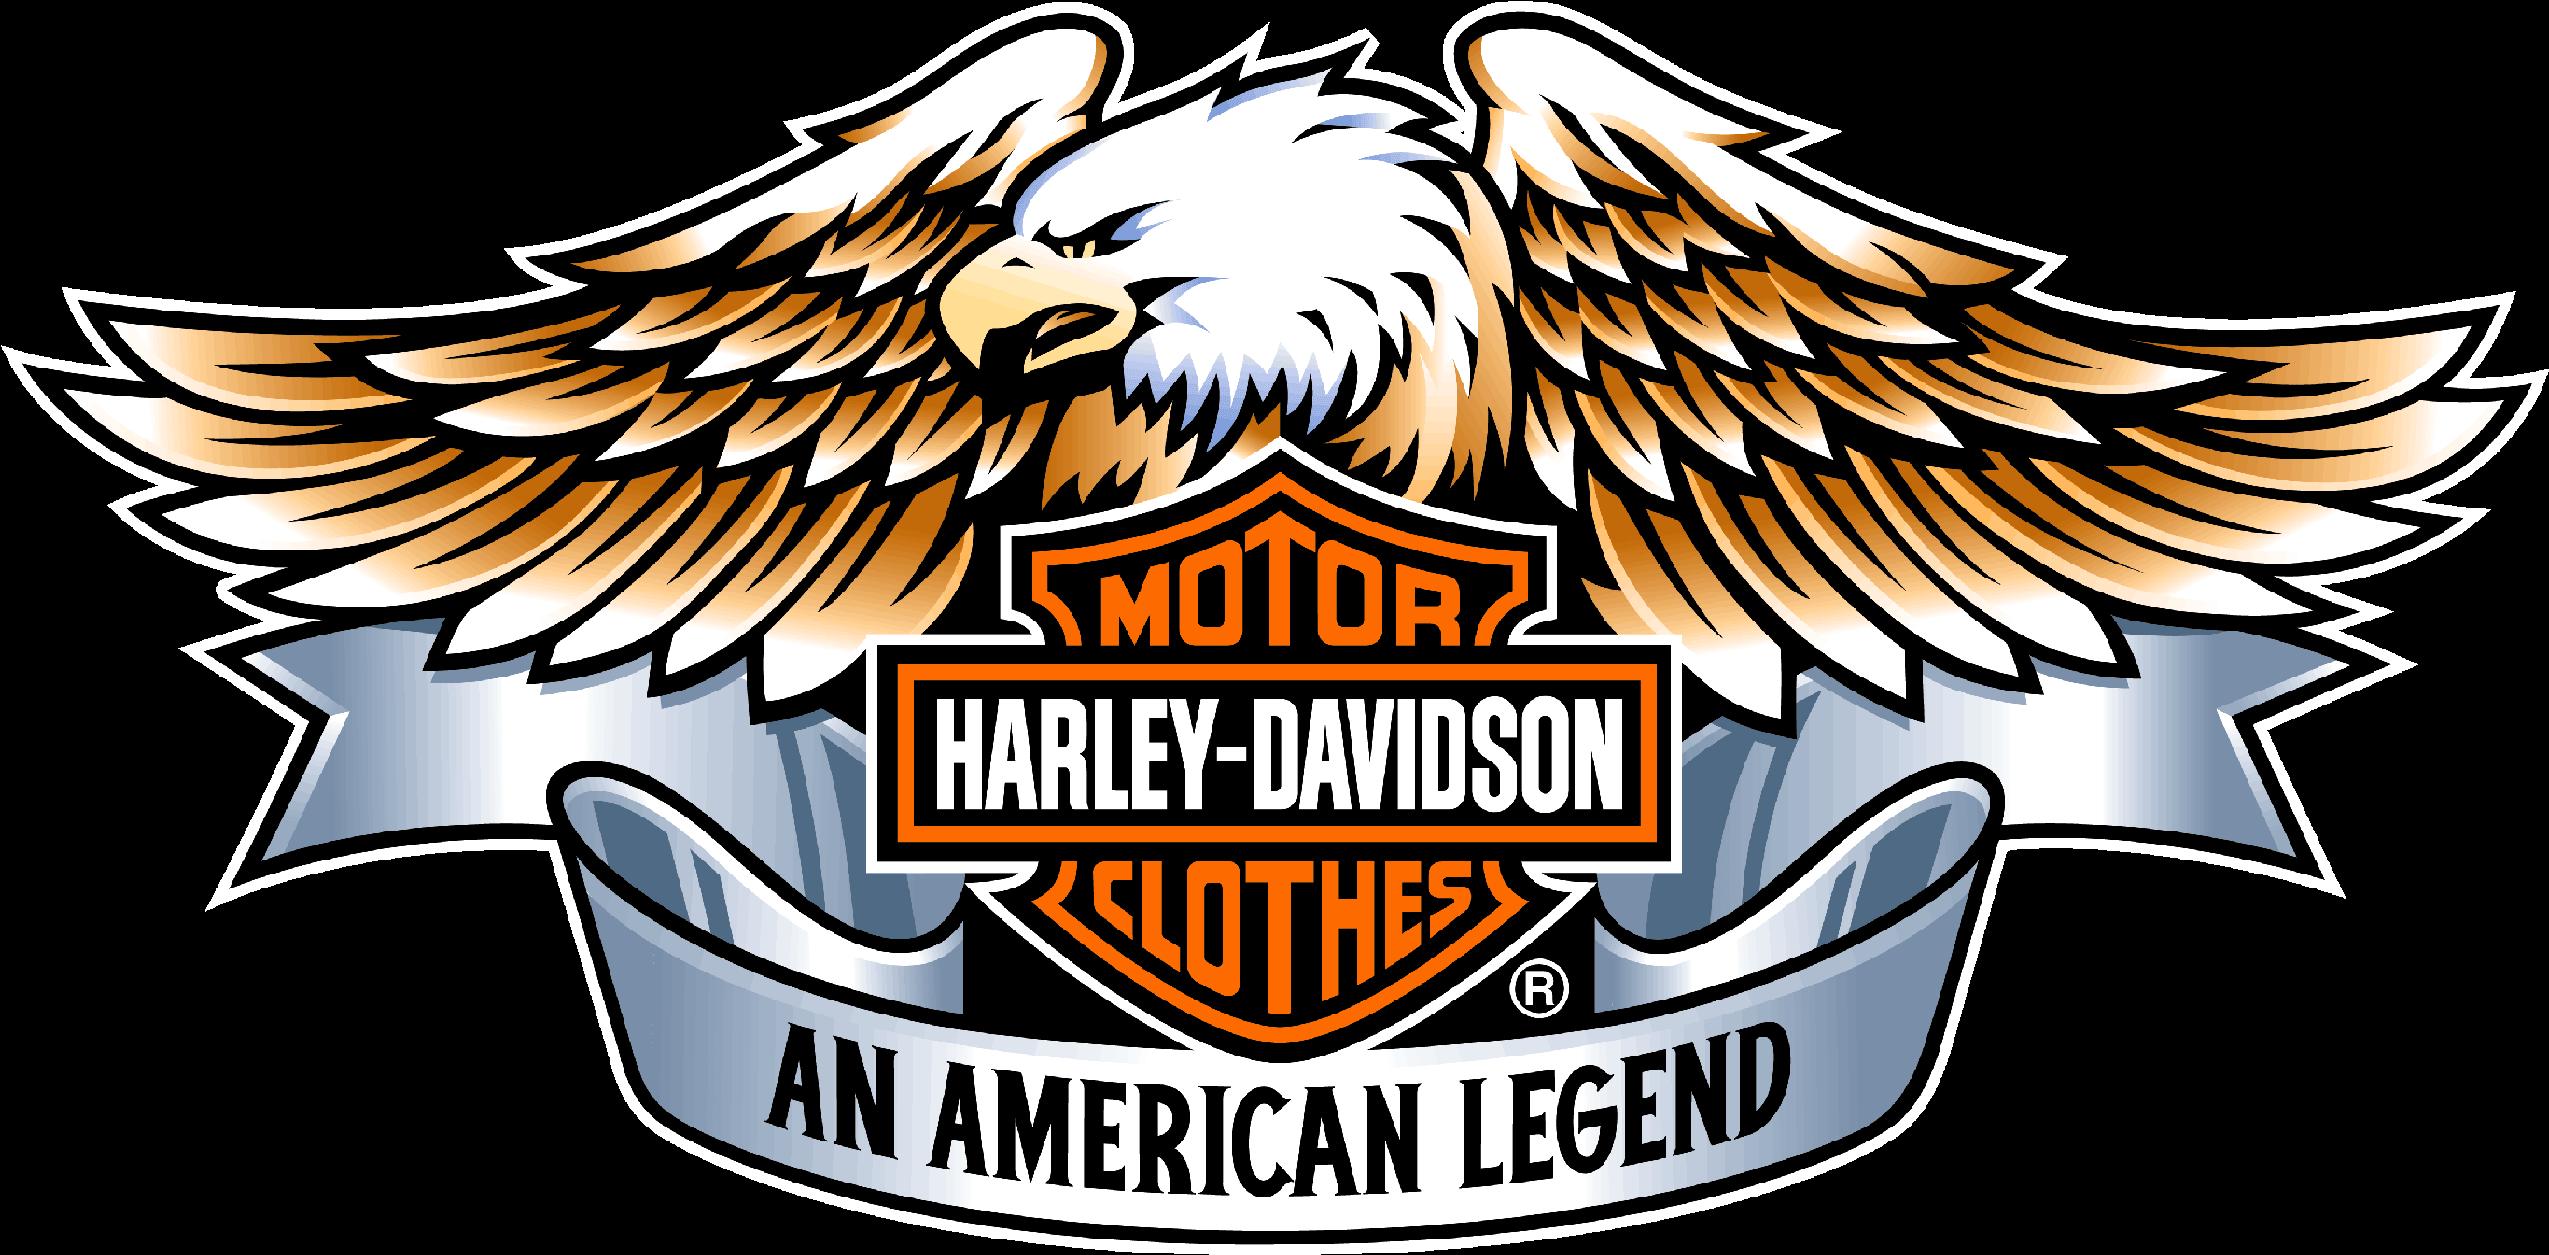 Harley Davidson Clipart Dxf.